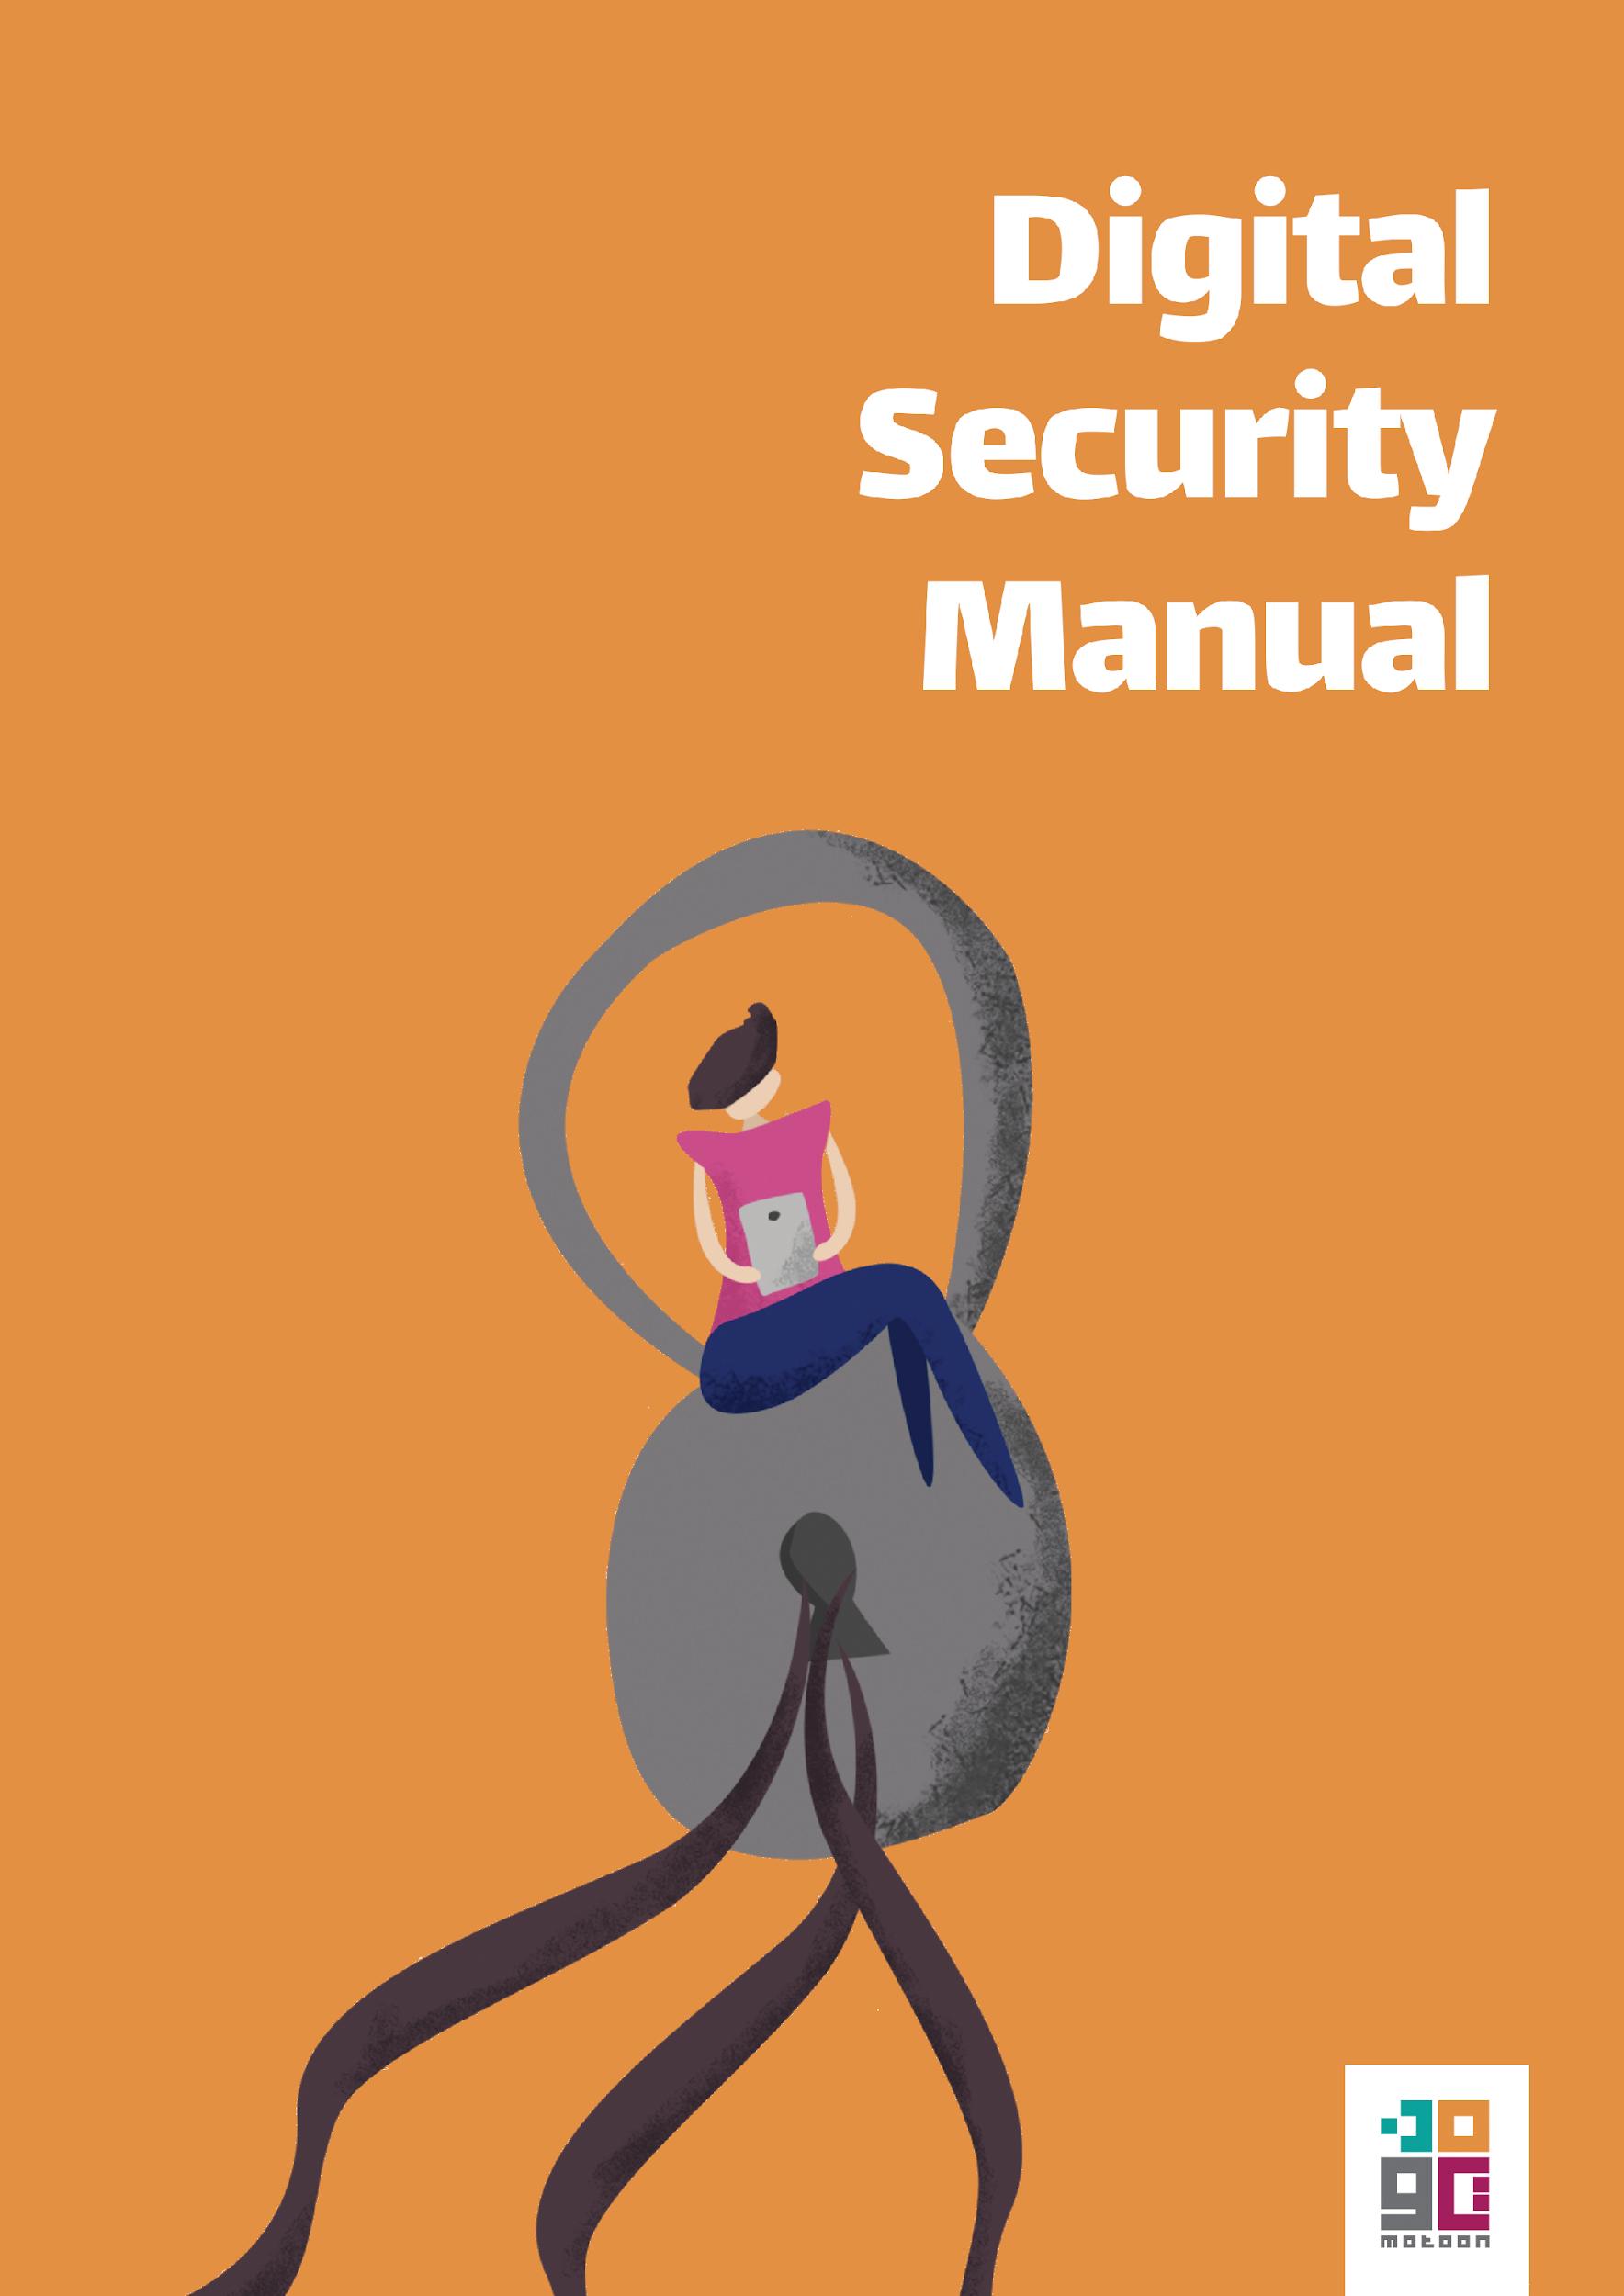 Digital Security Manual   Motoon